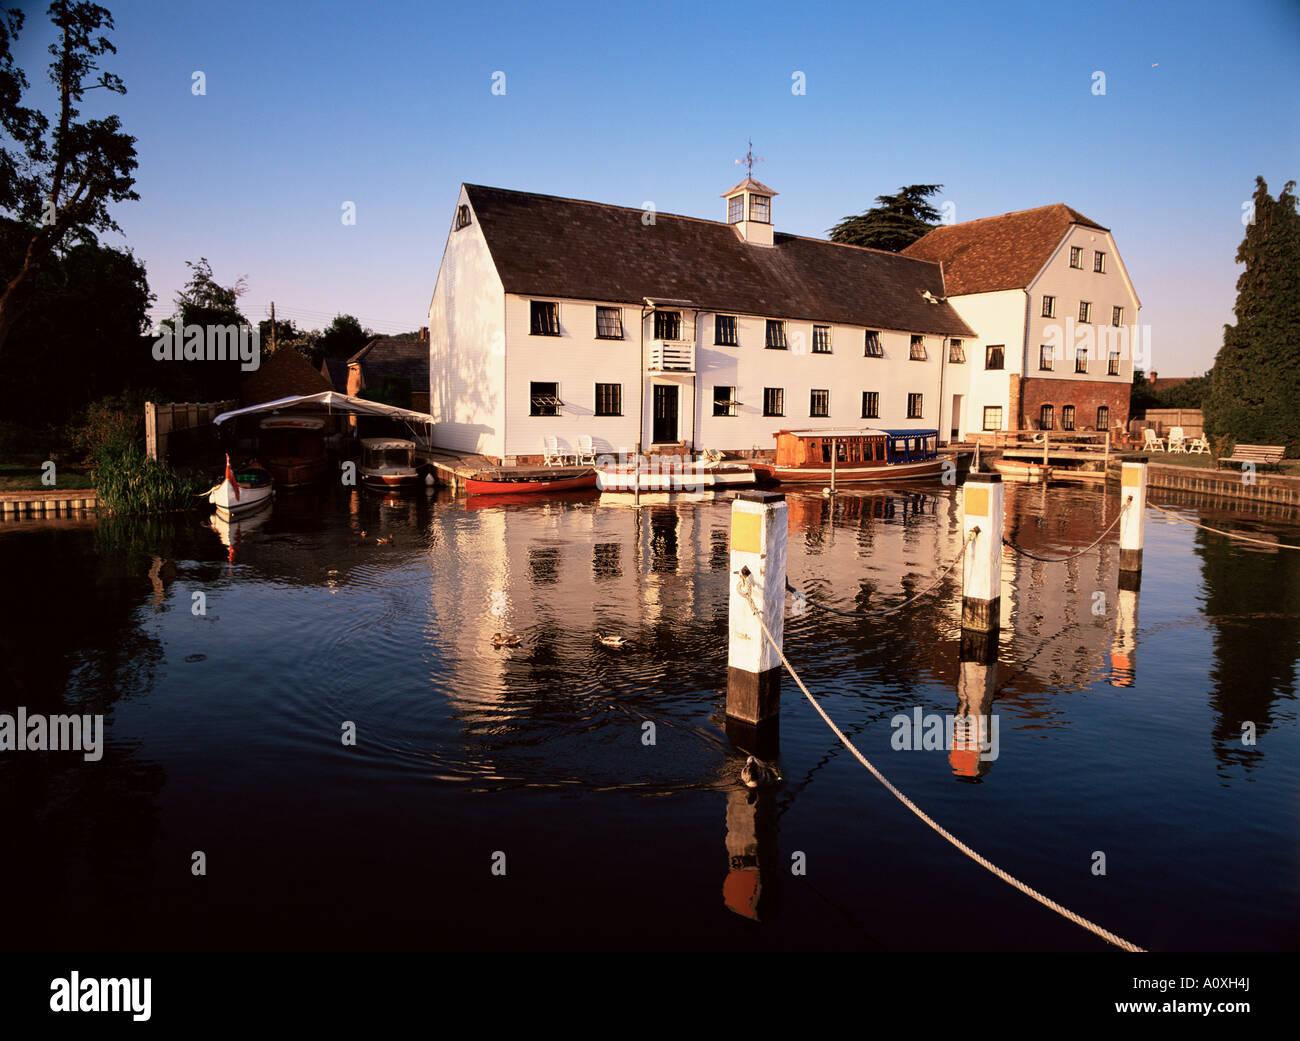 Hambleden Mill River Thames Buckinghamshire England United Kingdom Europe - Stock Image